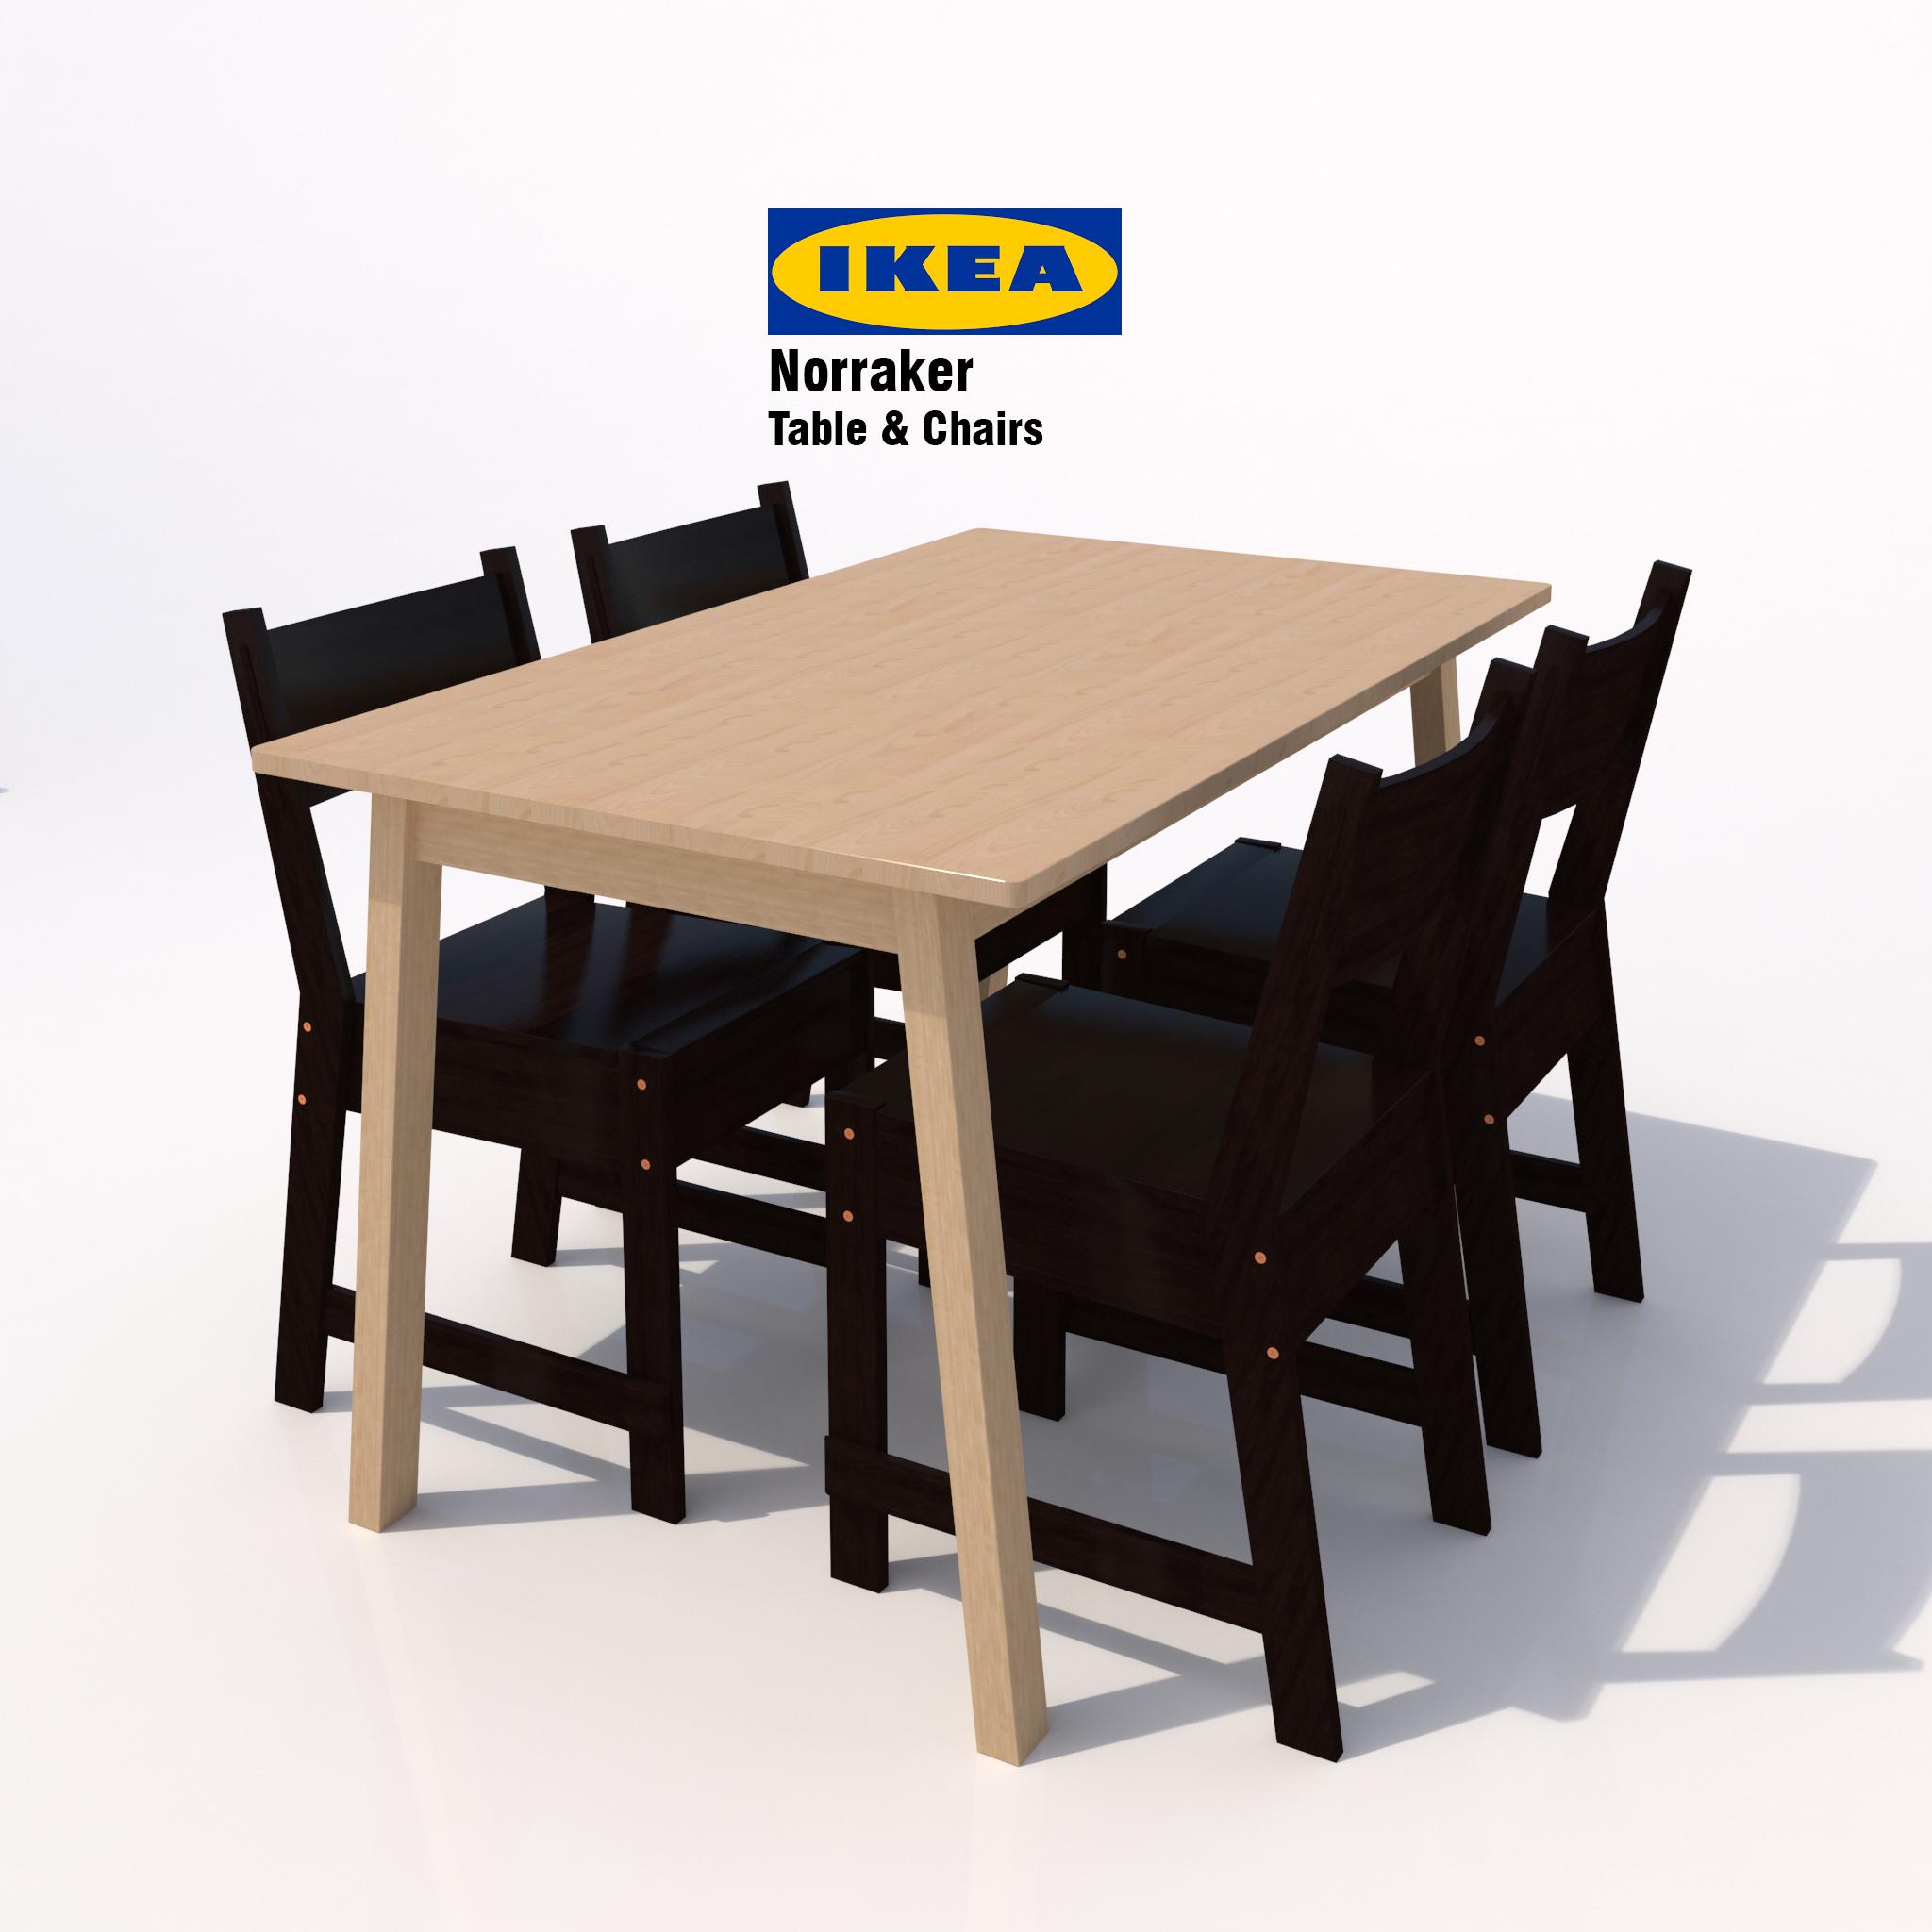 Ikea Norraker Dining Set 02b